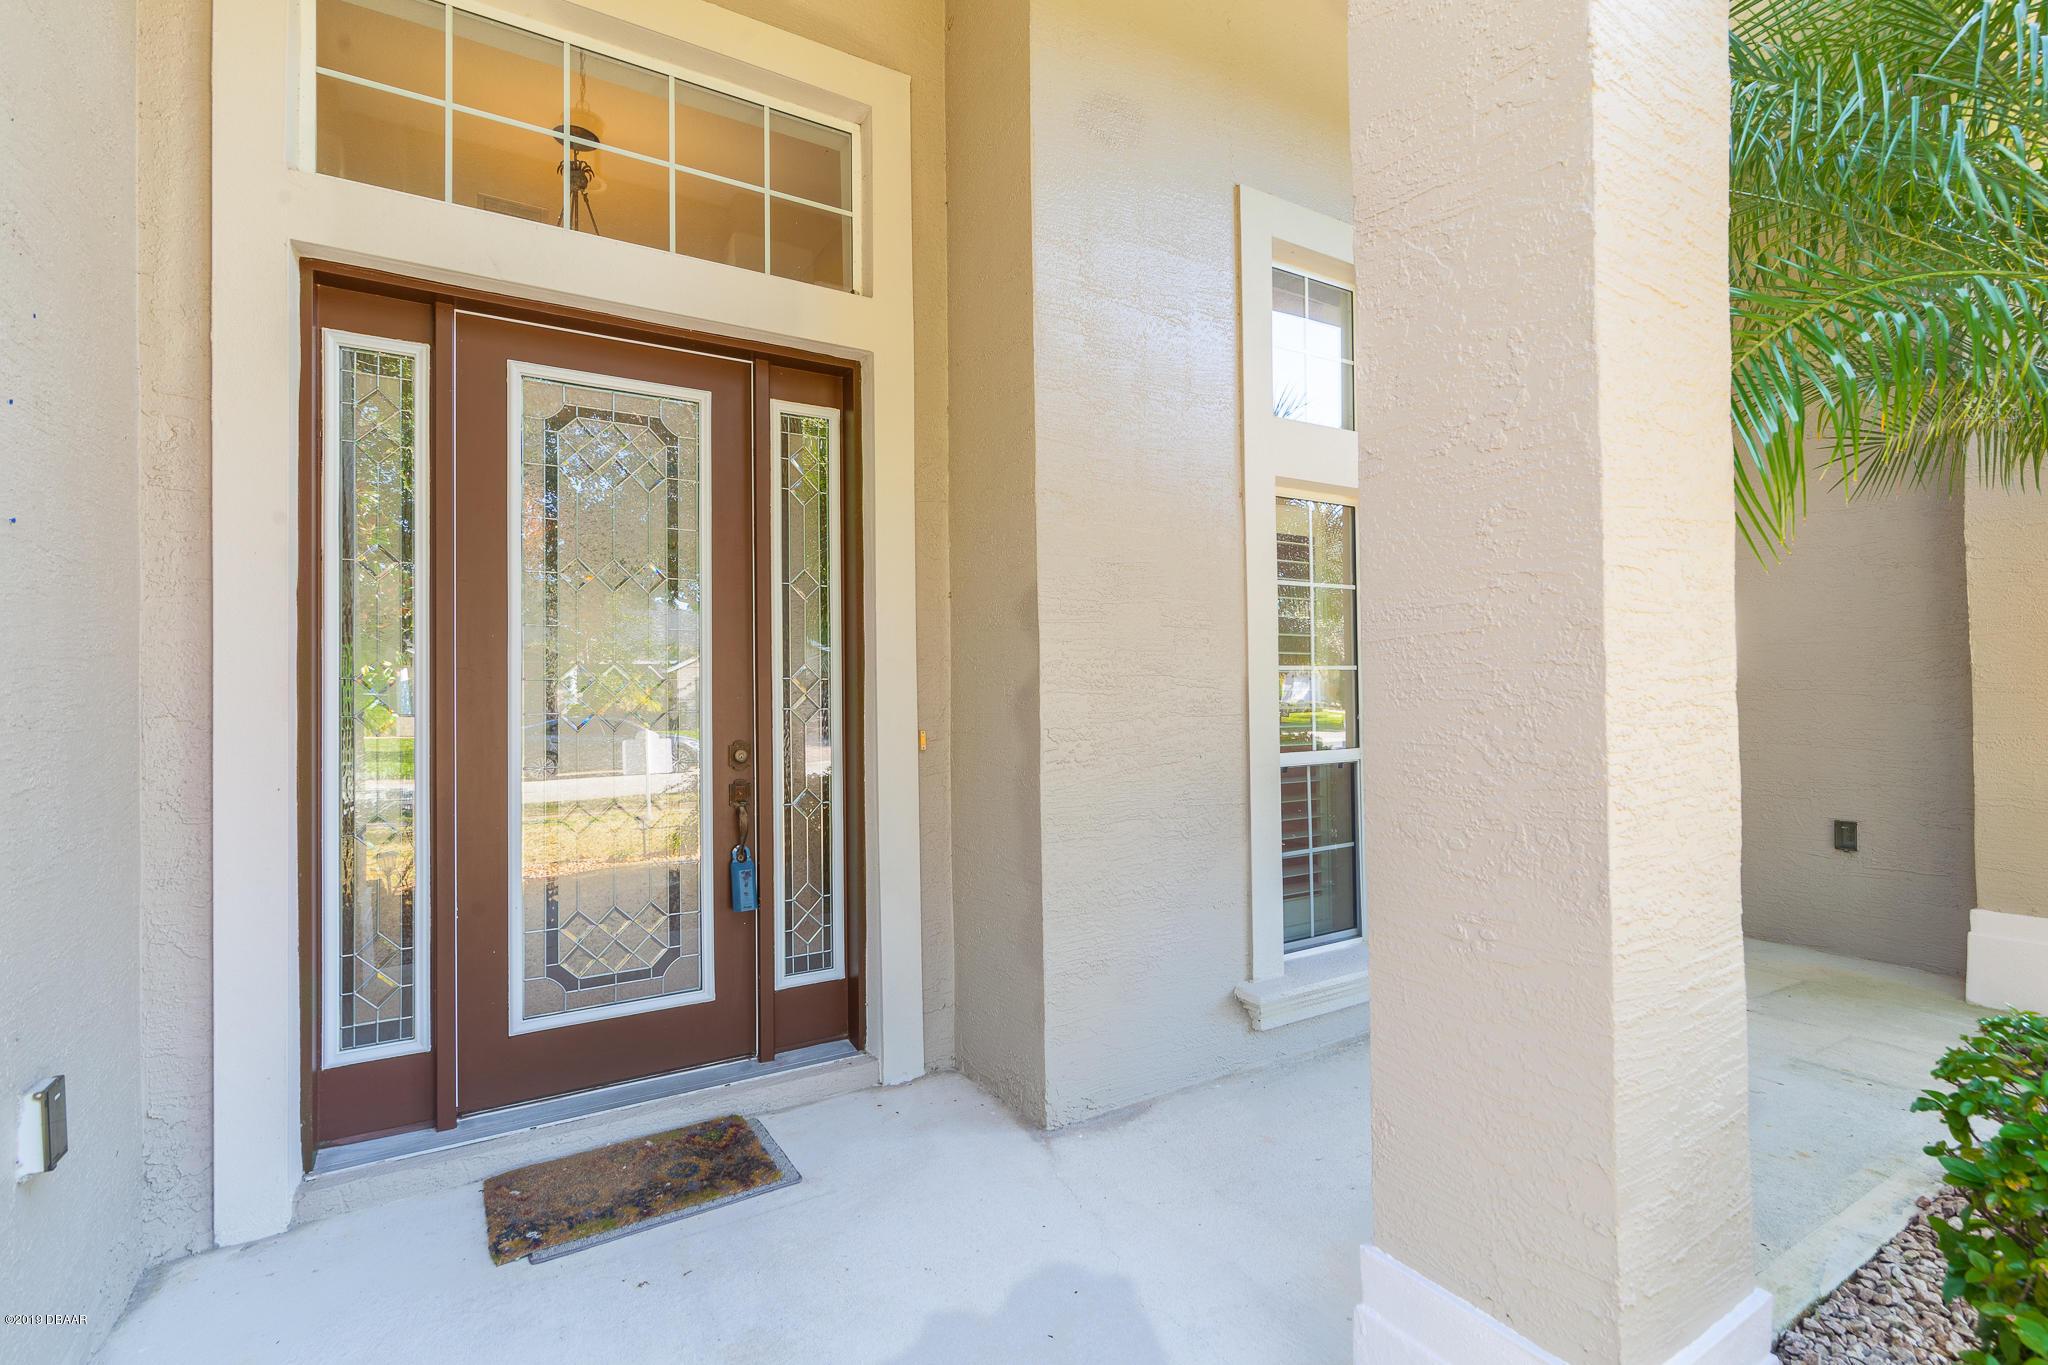 3317 Westmeath Drive, Ormond Beach, FL 32174, MLS # 1065089   Marina on wicklow house plan, waterford house plan, coleraine house plan,